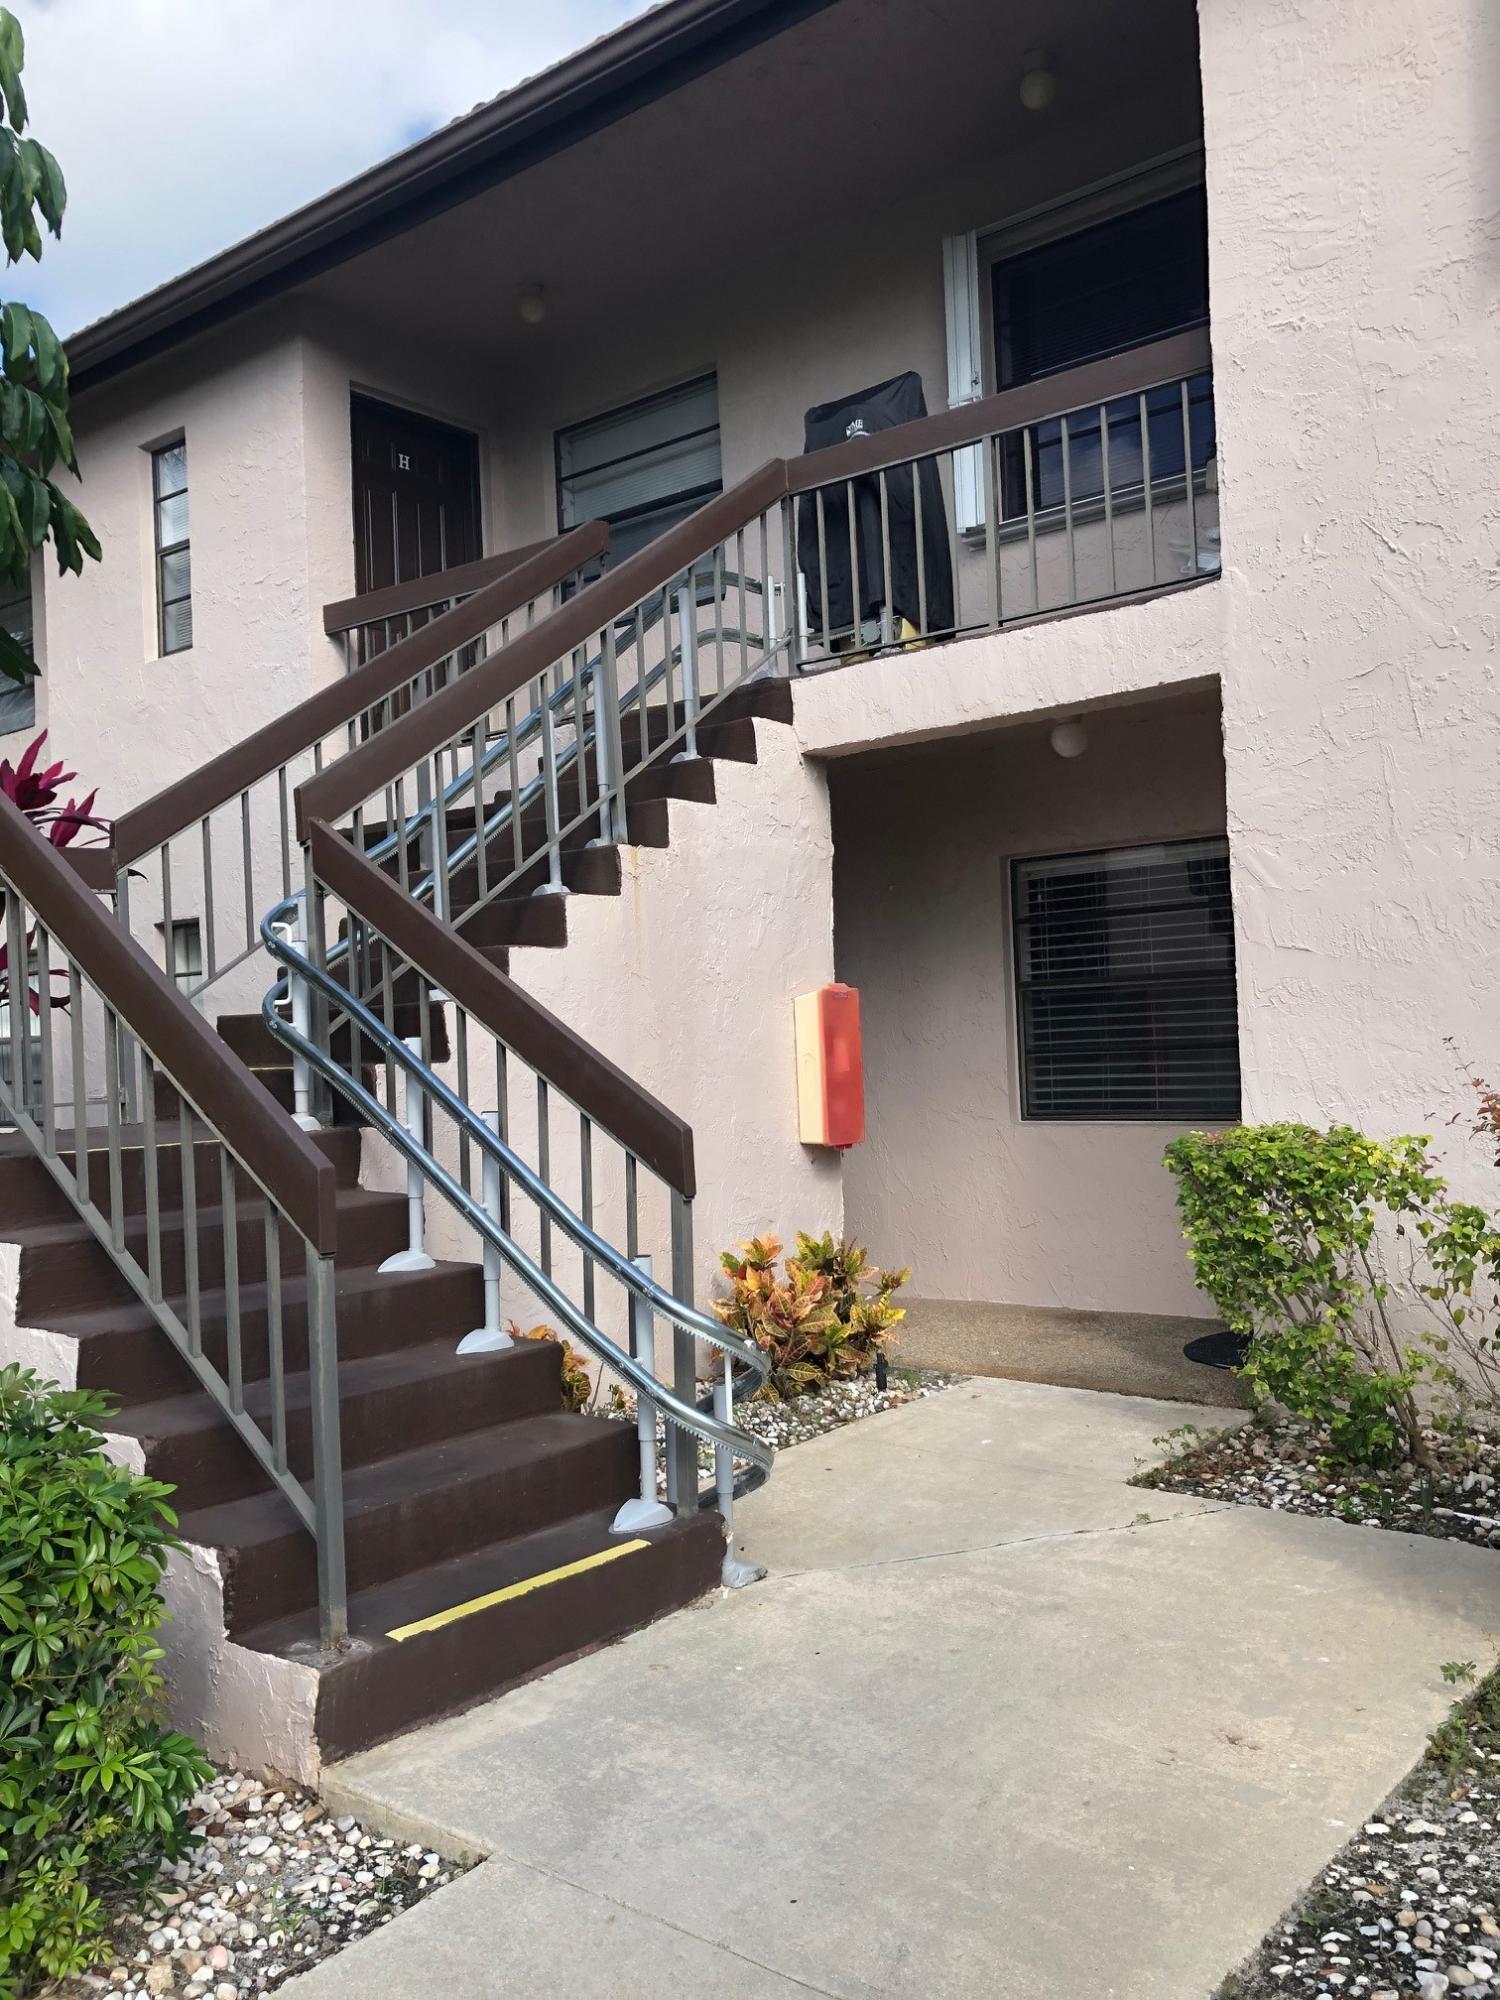 21364 Cypress Hammock Drive 1j Boca Raton, FL 33428 Boca Raton FL 33428